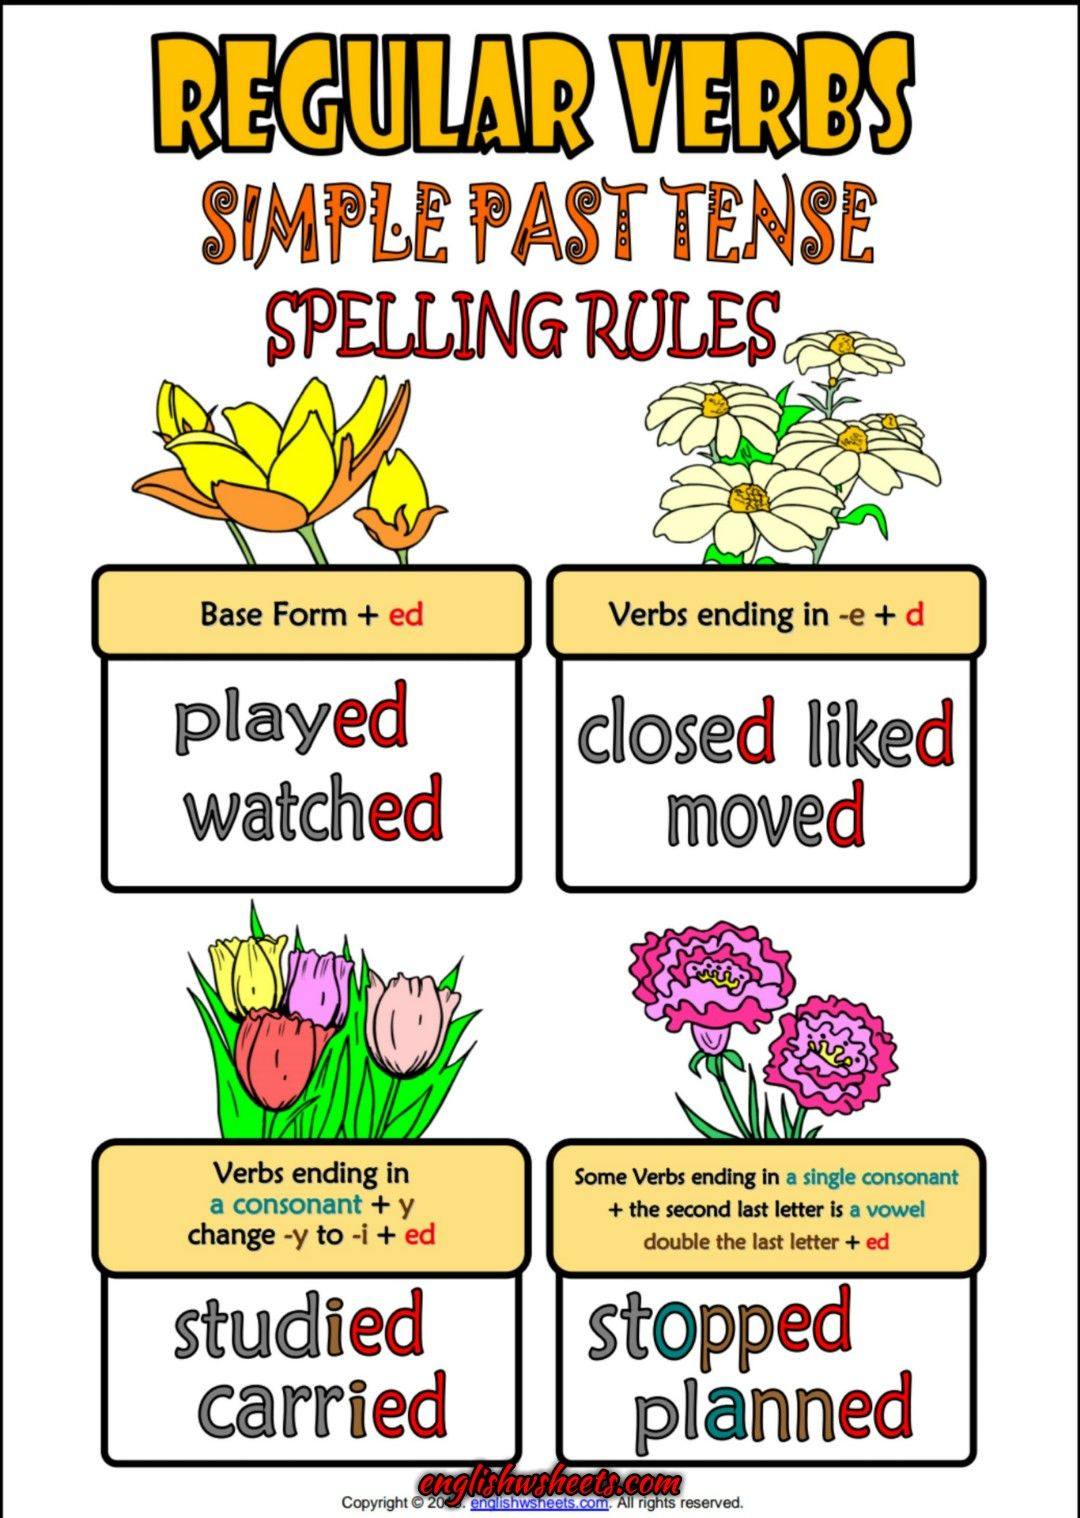 Regular Verbs Grammar Rules Esl Classroom Poster